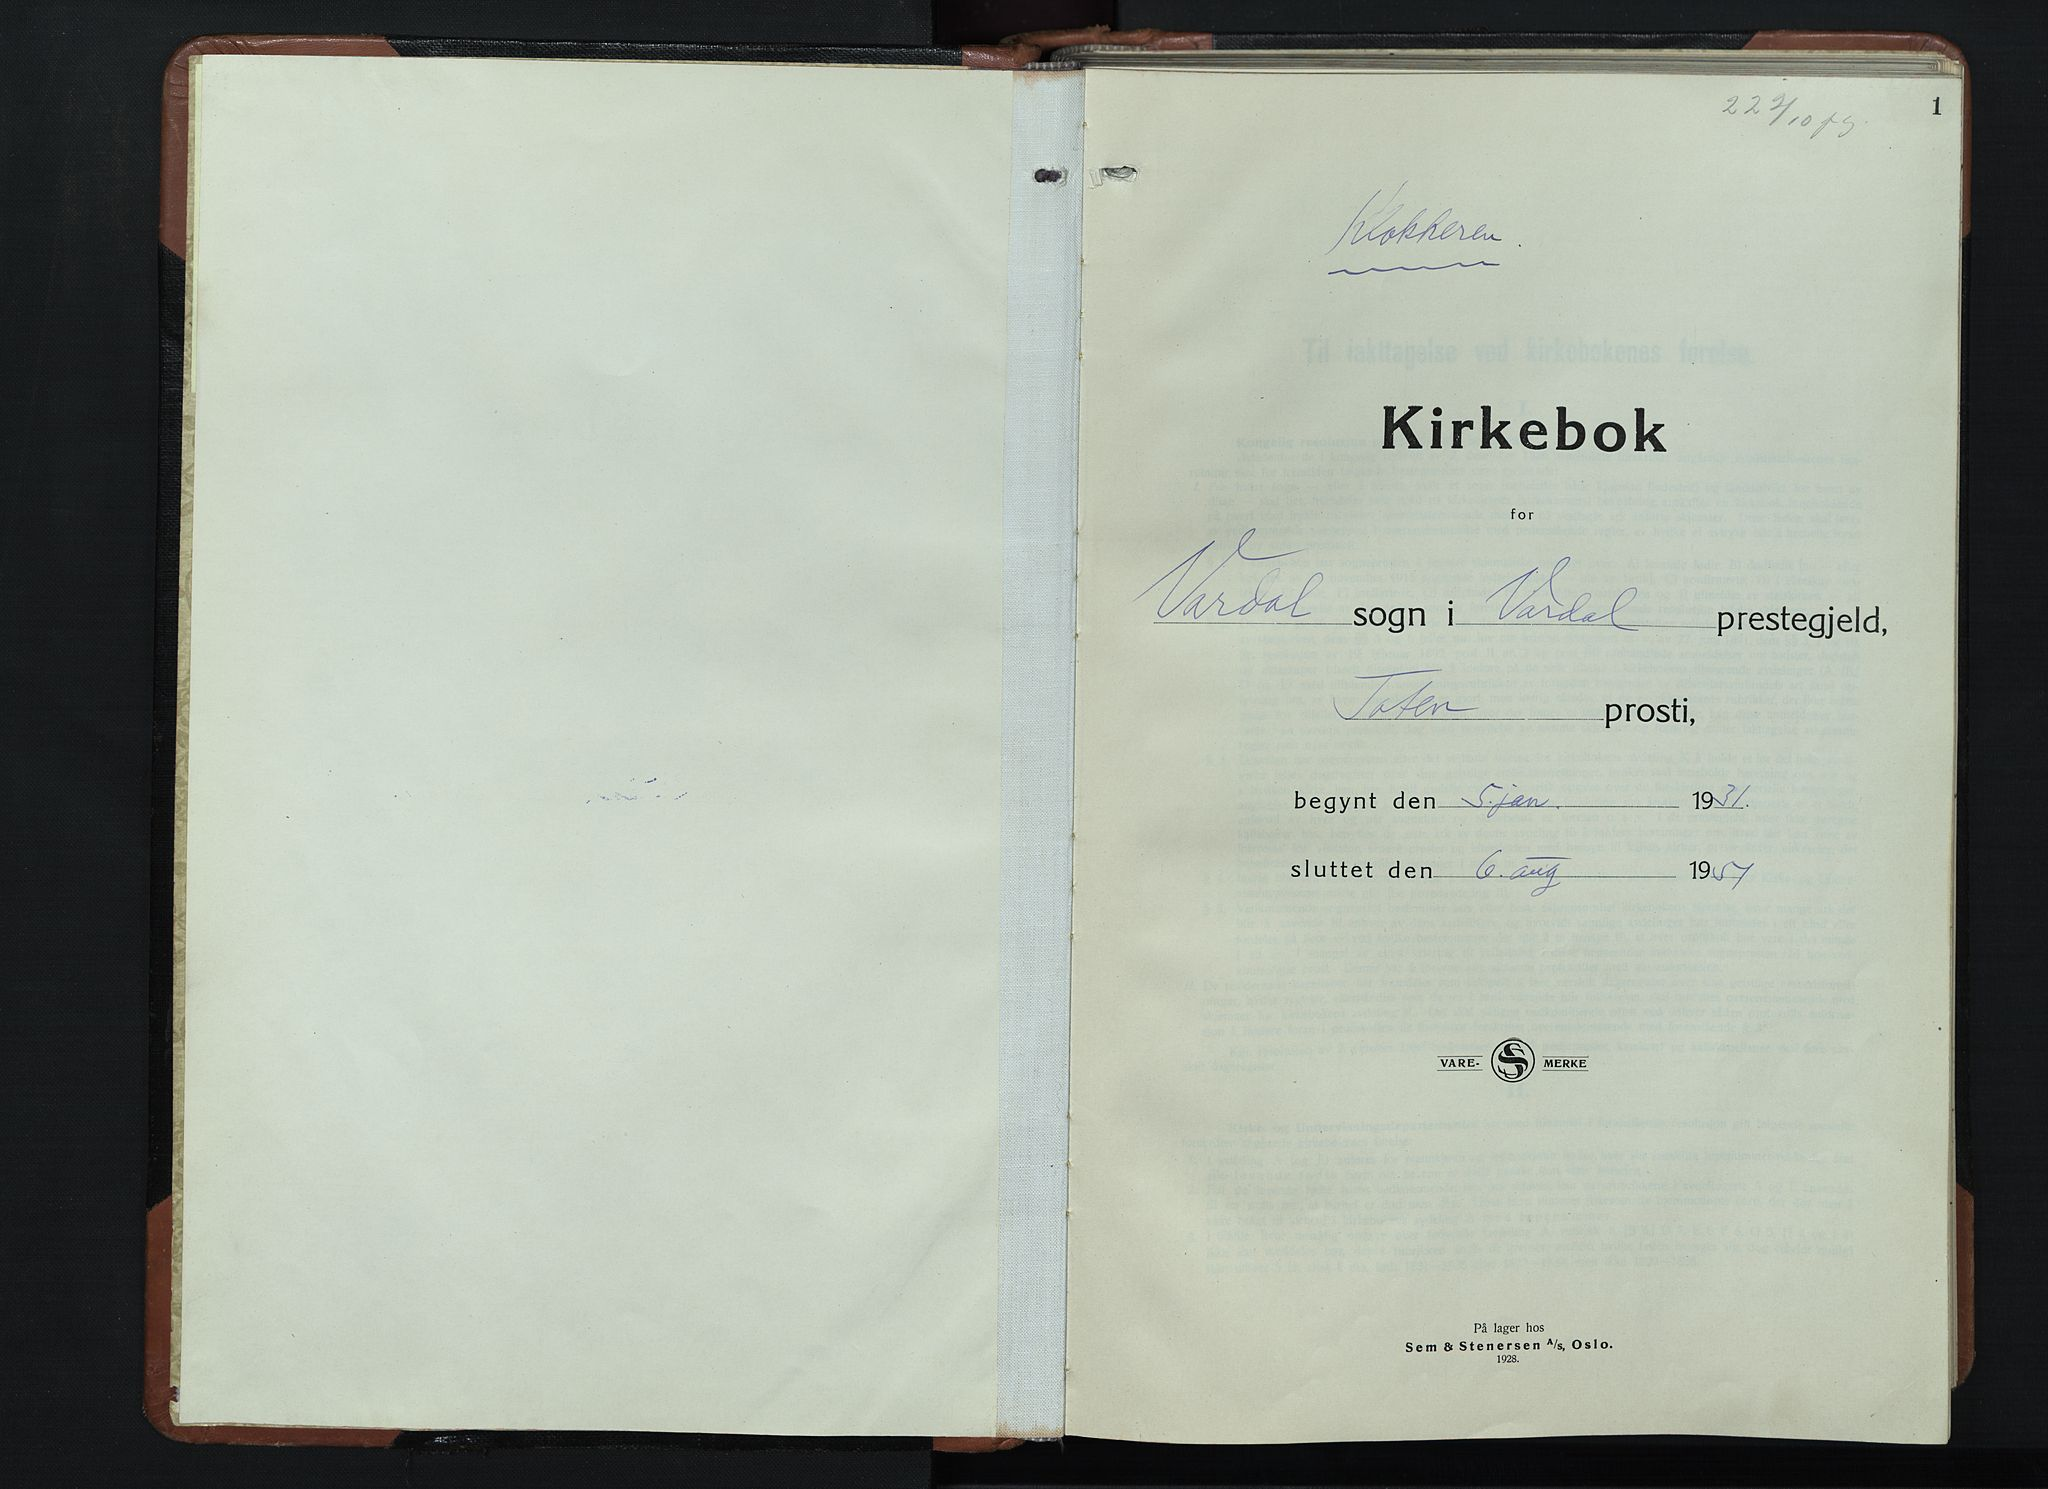 SAH, Vardal prestekontor, H/Ha/Hab/L0018: Klokkerbok nr. 18, 1931-1951, s. 1